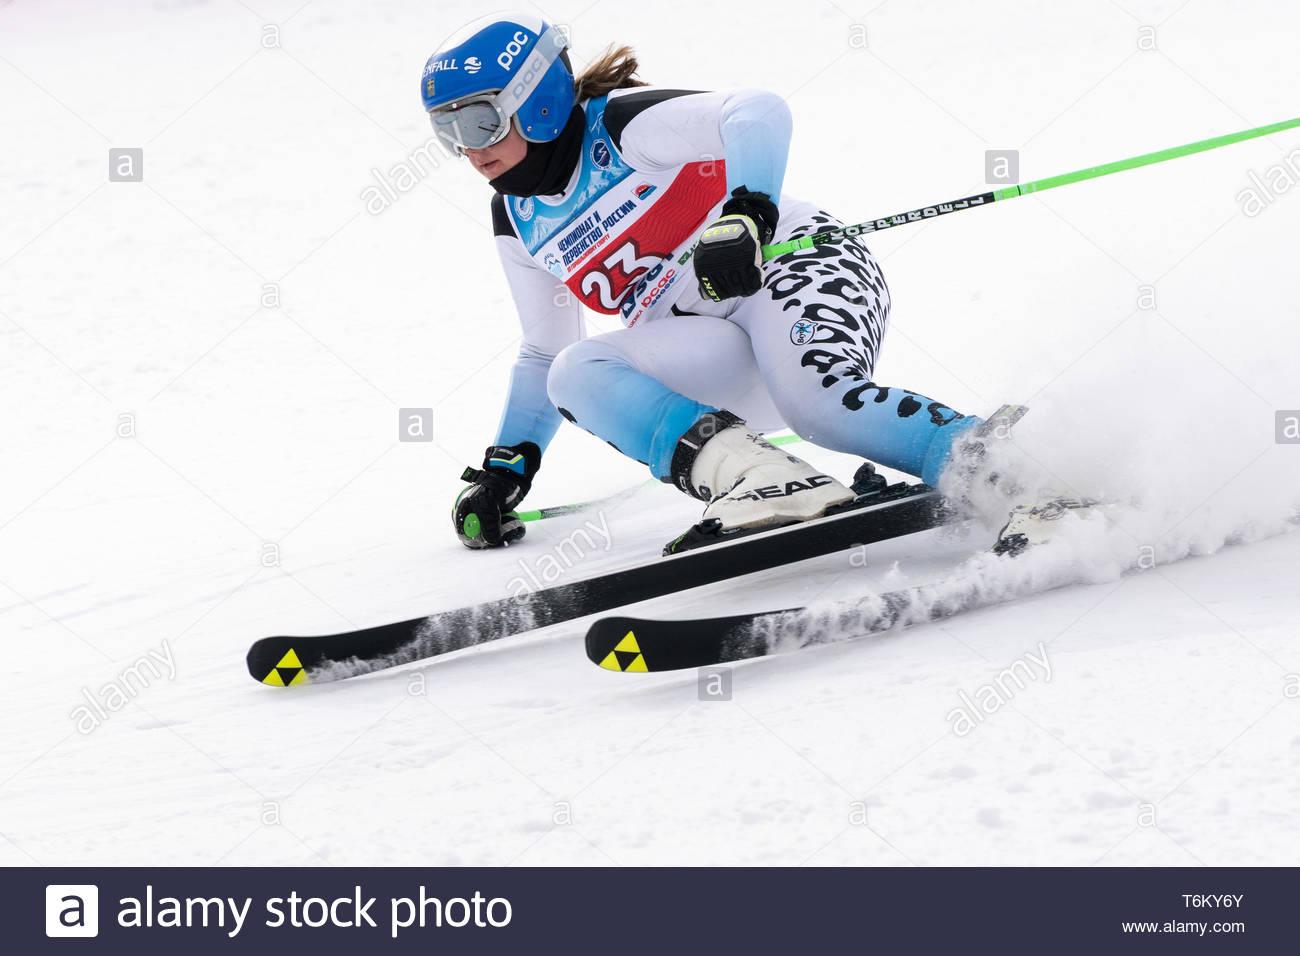 KAMCHATKA PENINSULA, RUSSIA - APR 2, 2019: Mountain skier Minaeva Anastasia (Murmansk) skiing down mount slope. Russian Women's Alpine Skiing Cup Inte - Stock Image